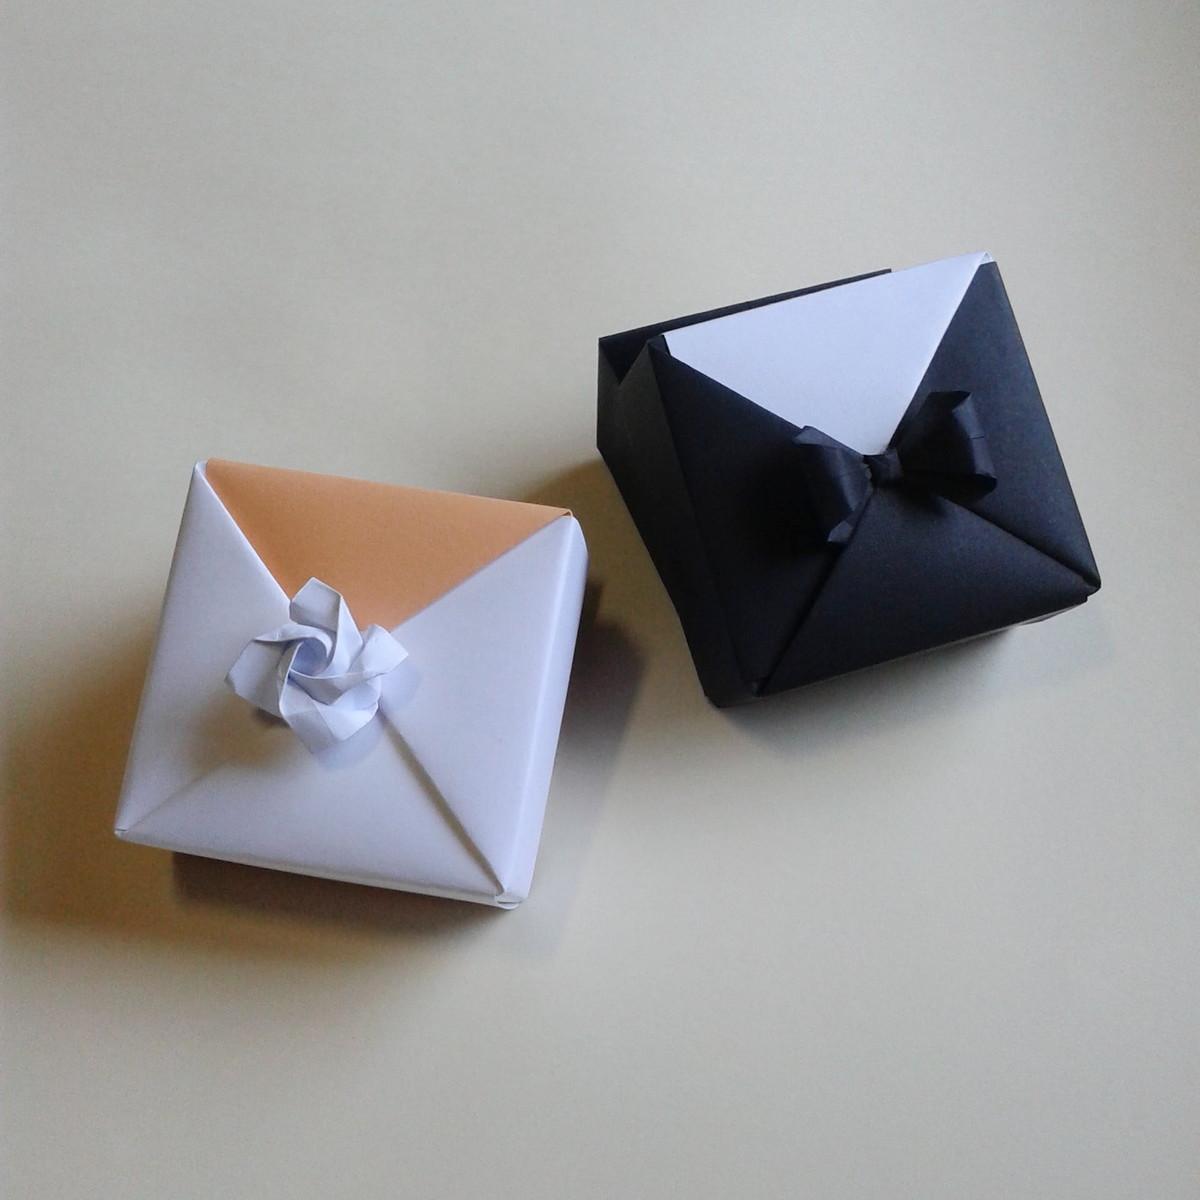 Caixa De Origami Noivos Par No Elo7 Naiane Origamis 77befc